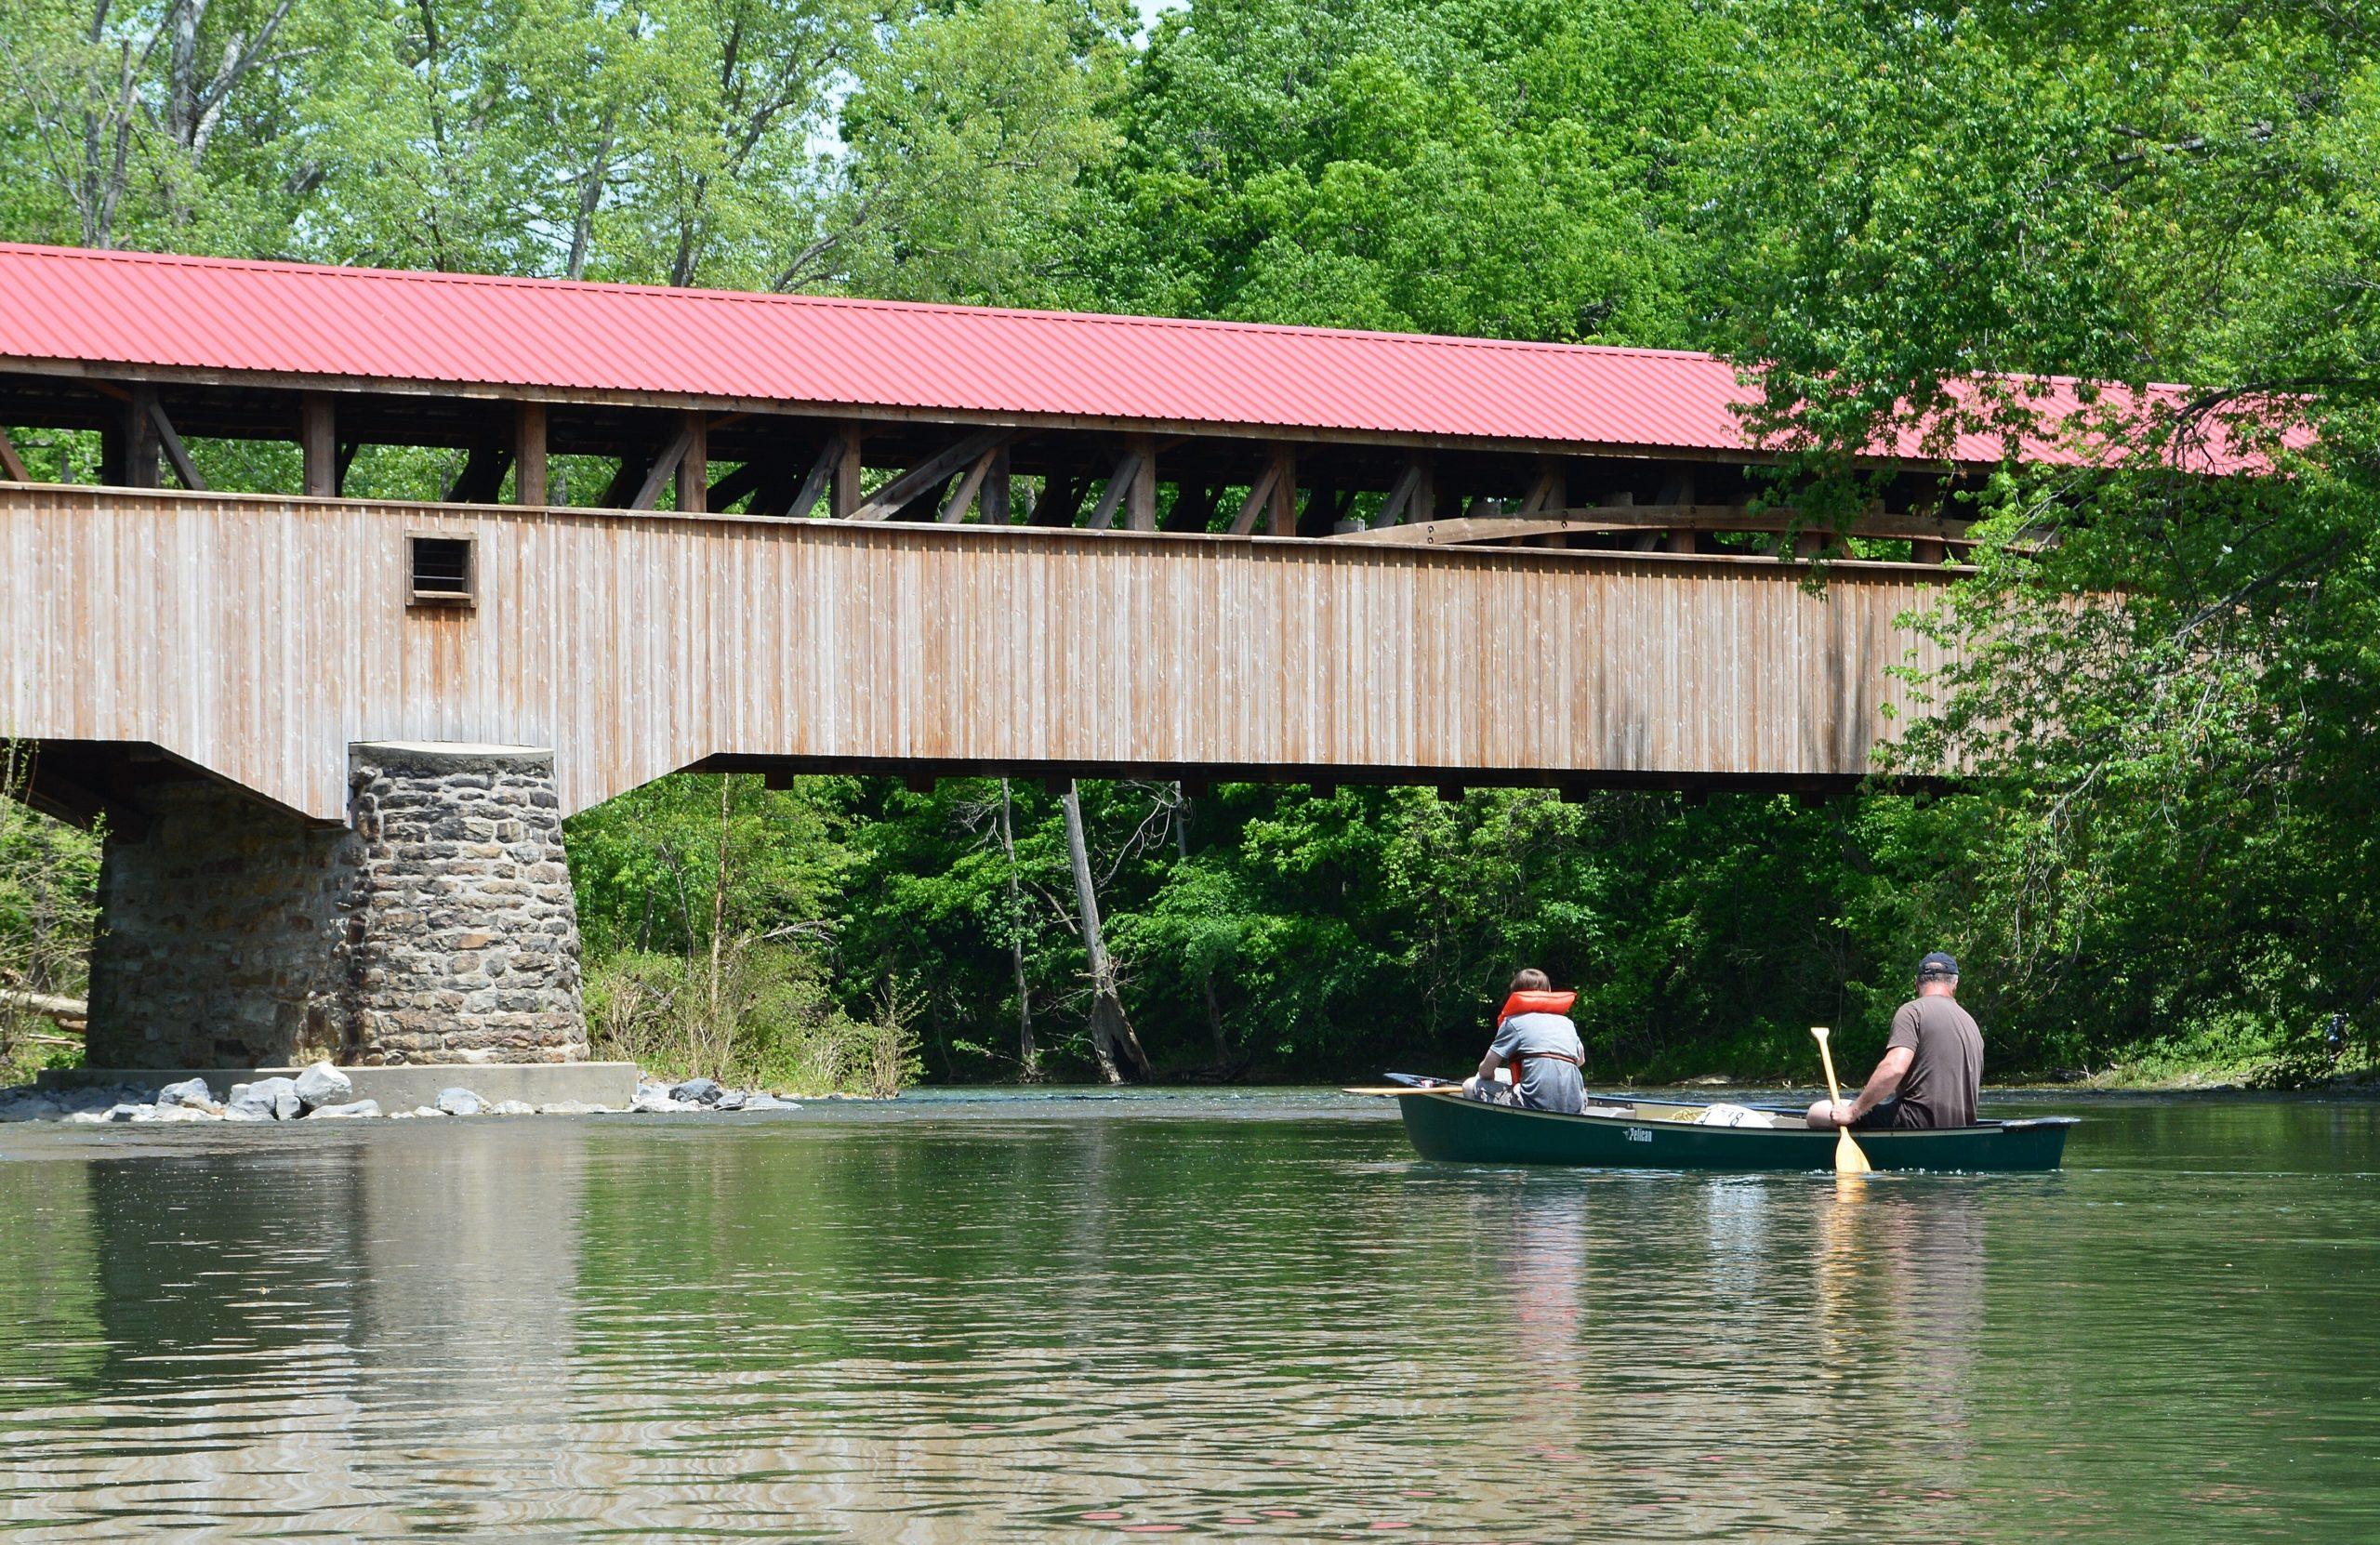 Photo of Mifflin & Juniata Counties, Pennsylvania